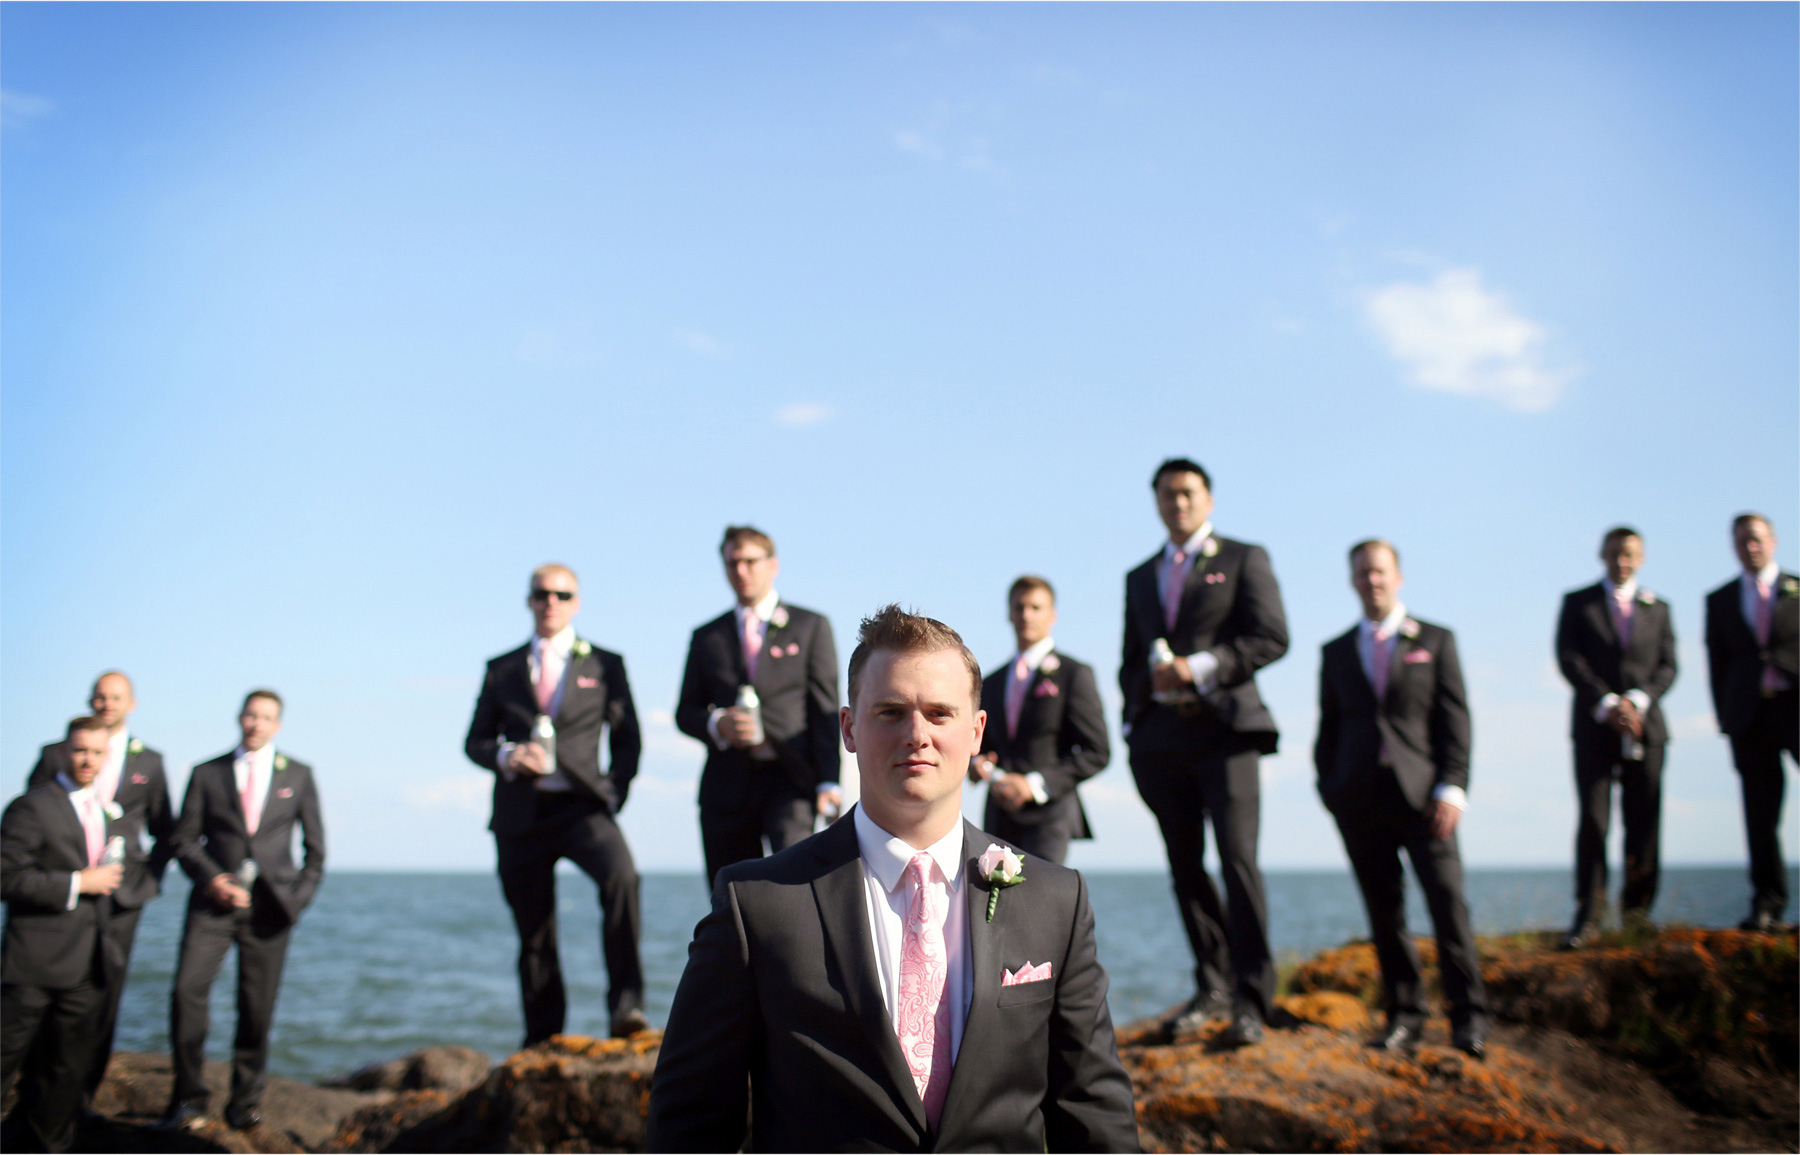 15-Duluth-Minnesota-Wedding-Photographer-by-Andrew-Vick-Photography-Summer-Groom-Groomsmen-Lake-Superior-Lindsey-and-Adam.jpg